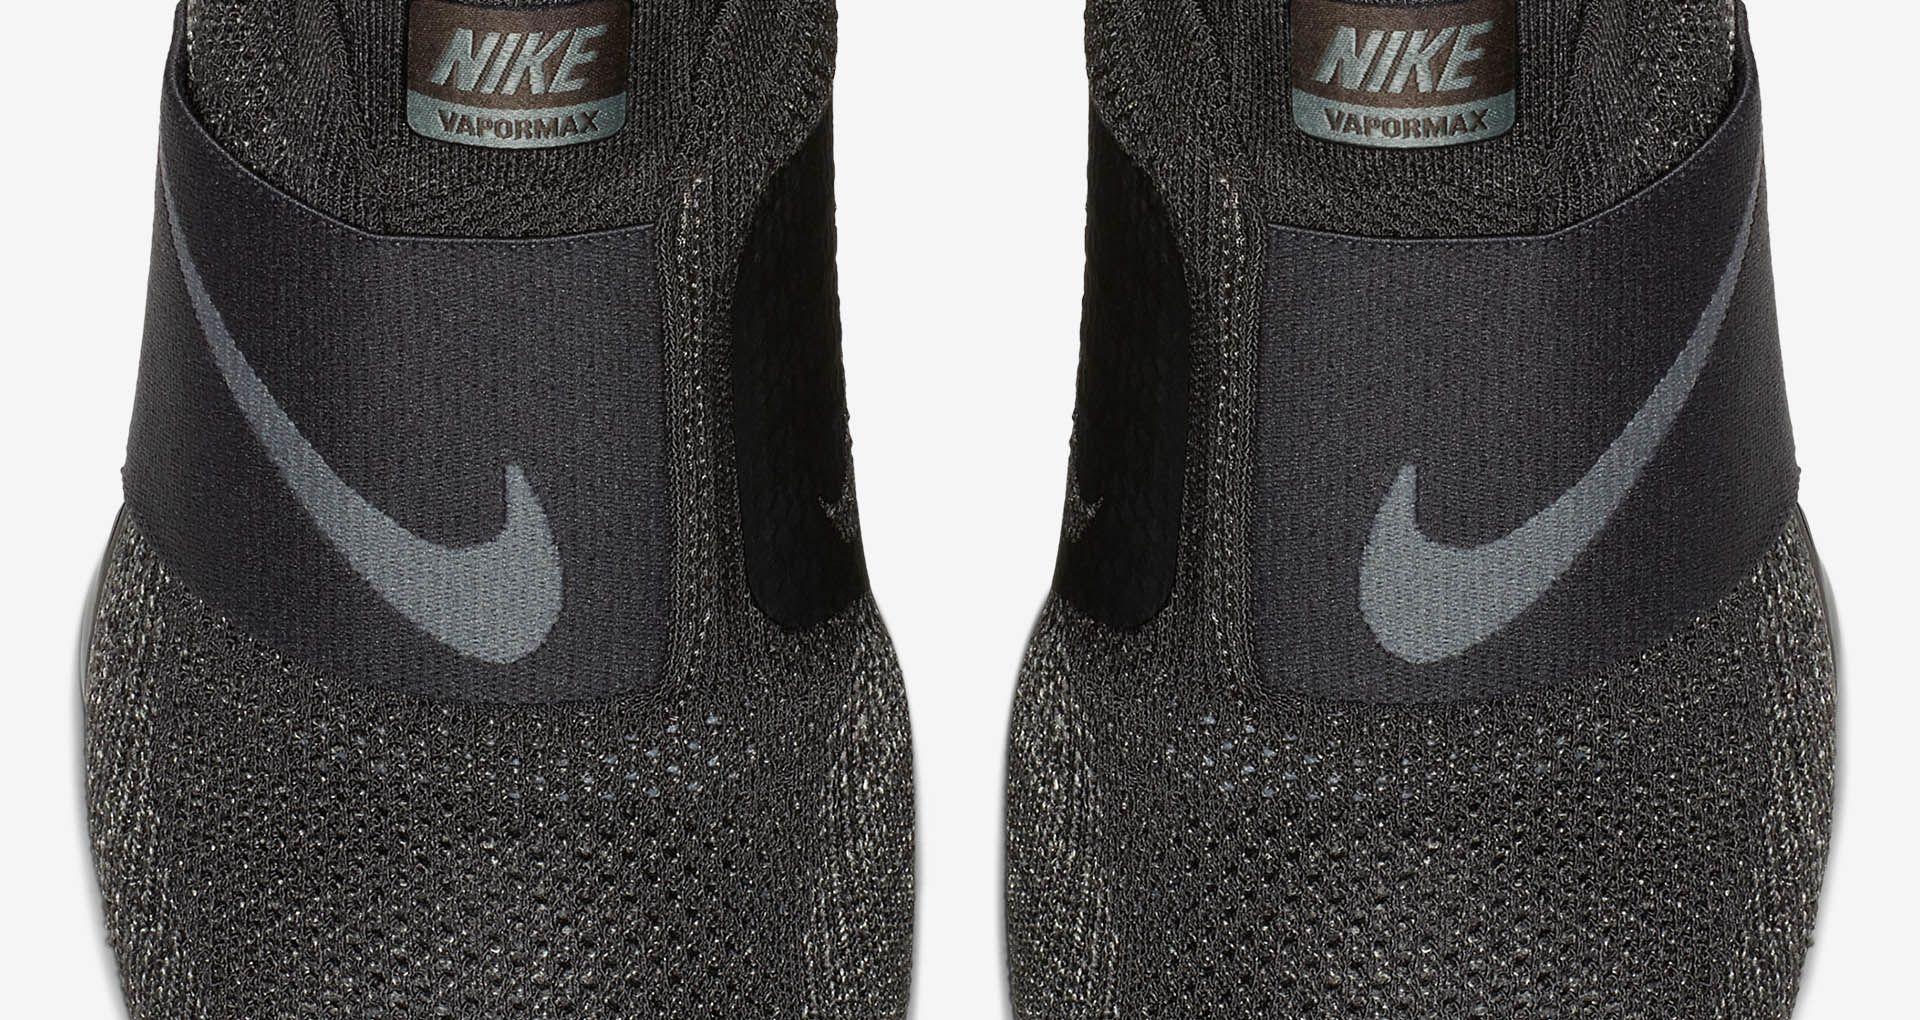 9d6abca9e3a89 Nike Air Vapormax Moc  Midnight Fog   Legion Green  Release Date ...